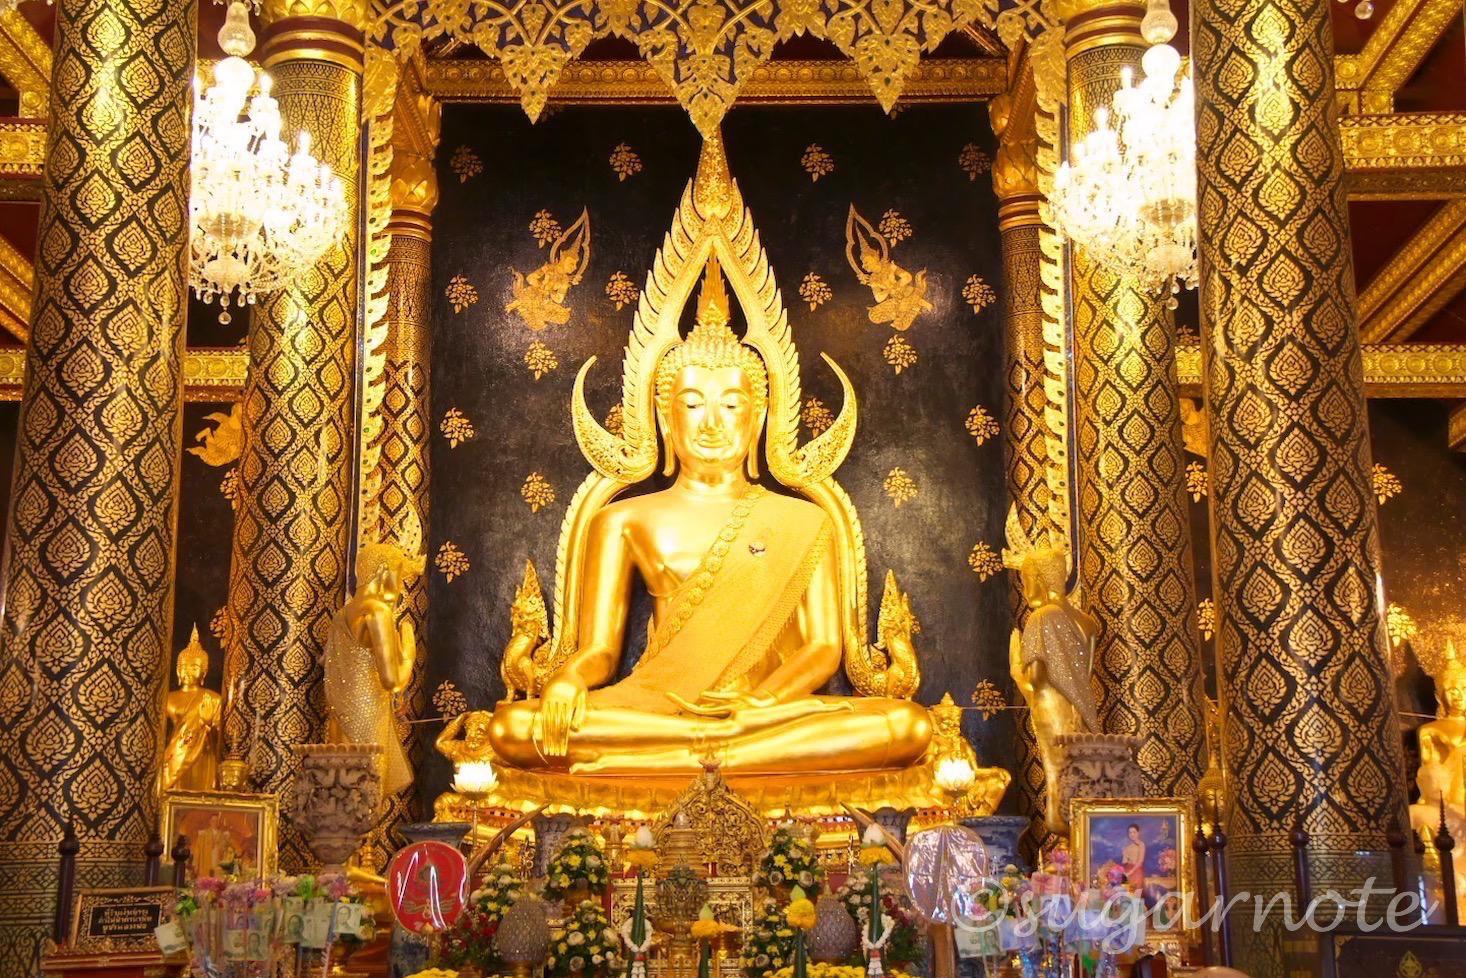 Wat Phra Sri Ratana Mahathat, Wat Yai, ワット・プラ・シー・ラタナー・マハータート, ワット・ヤイ, チンナラート仏像, Phra Buddha Chinnaraj Image